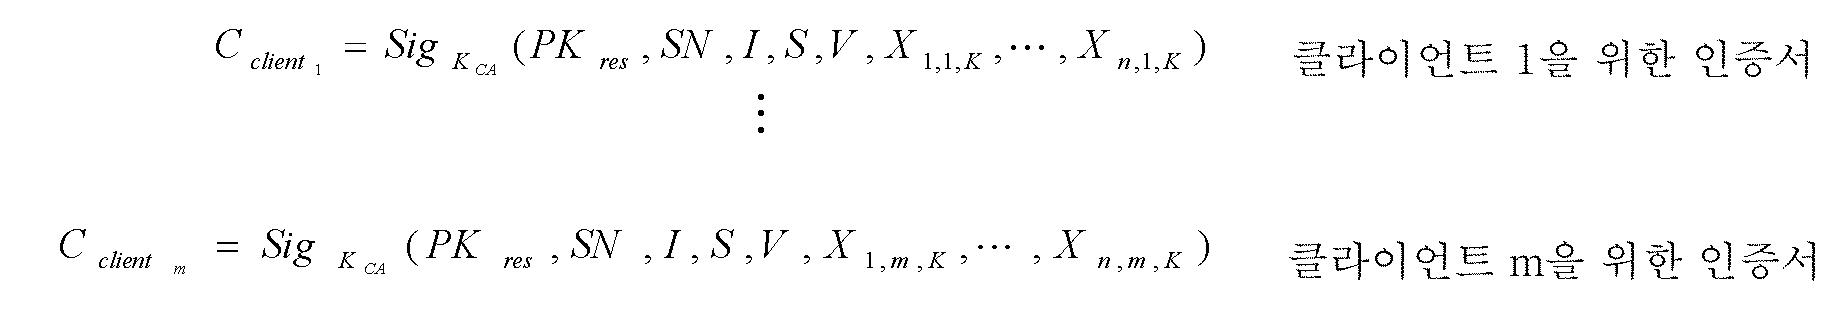 Figure 112005032693787-pat00004